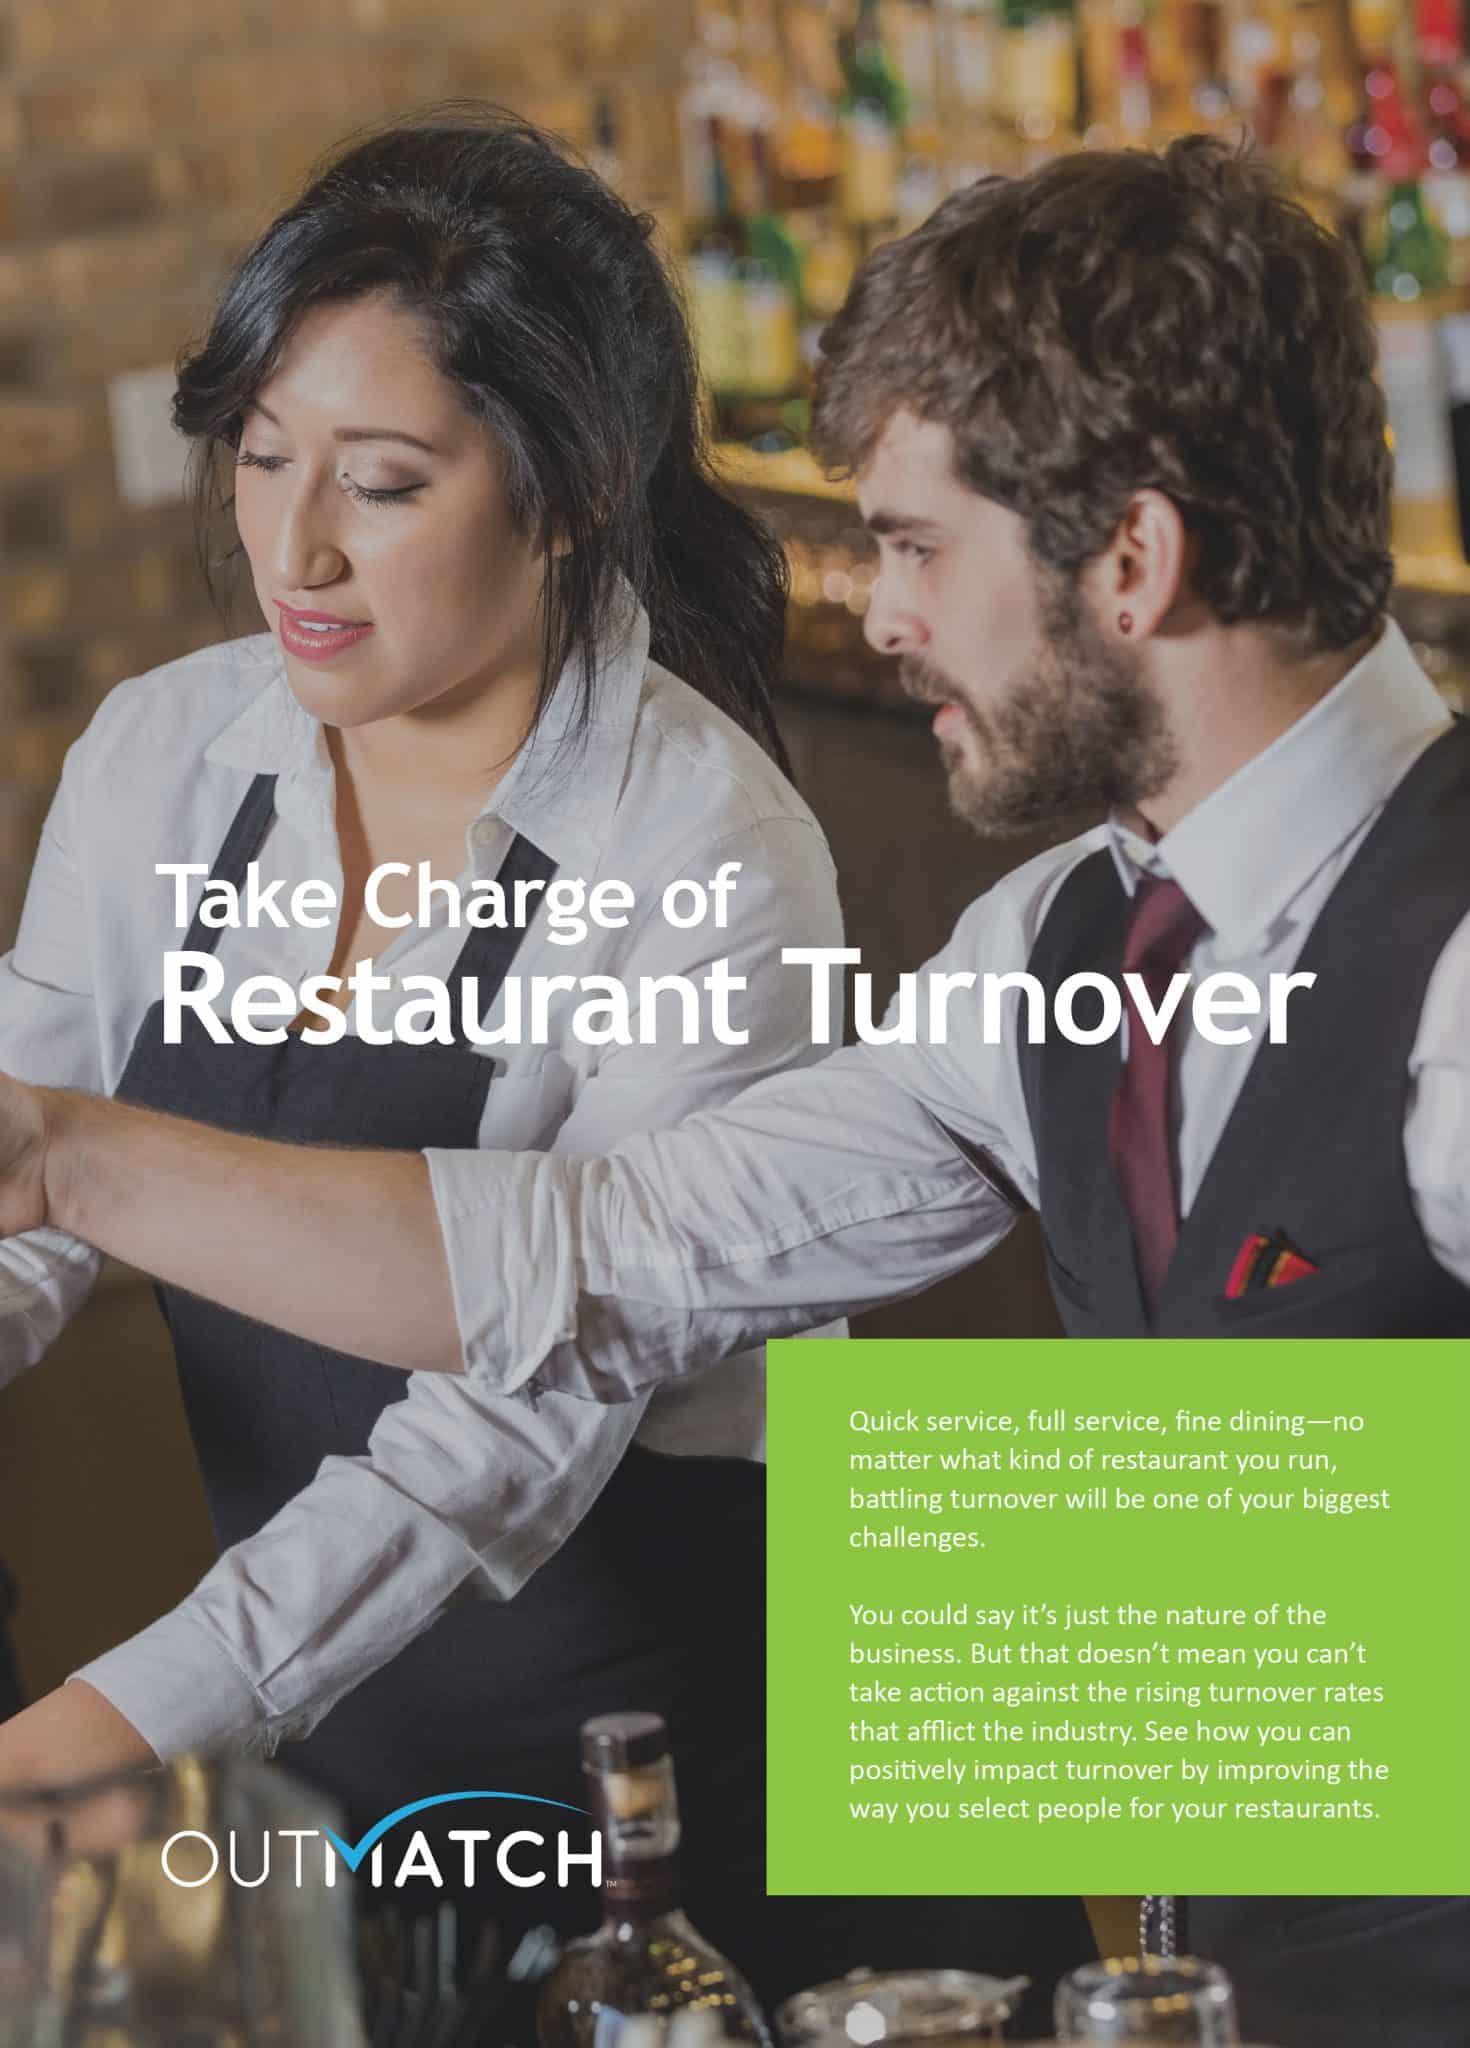 take charge of restaurant turnover - blog teaser